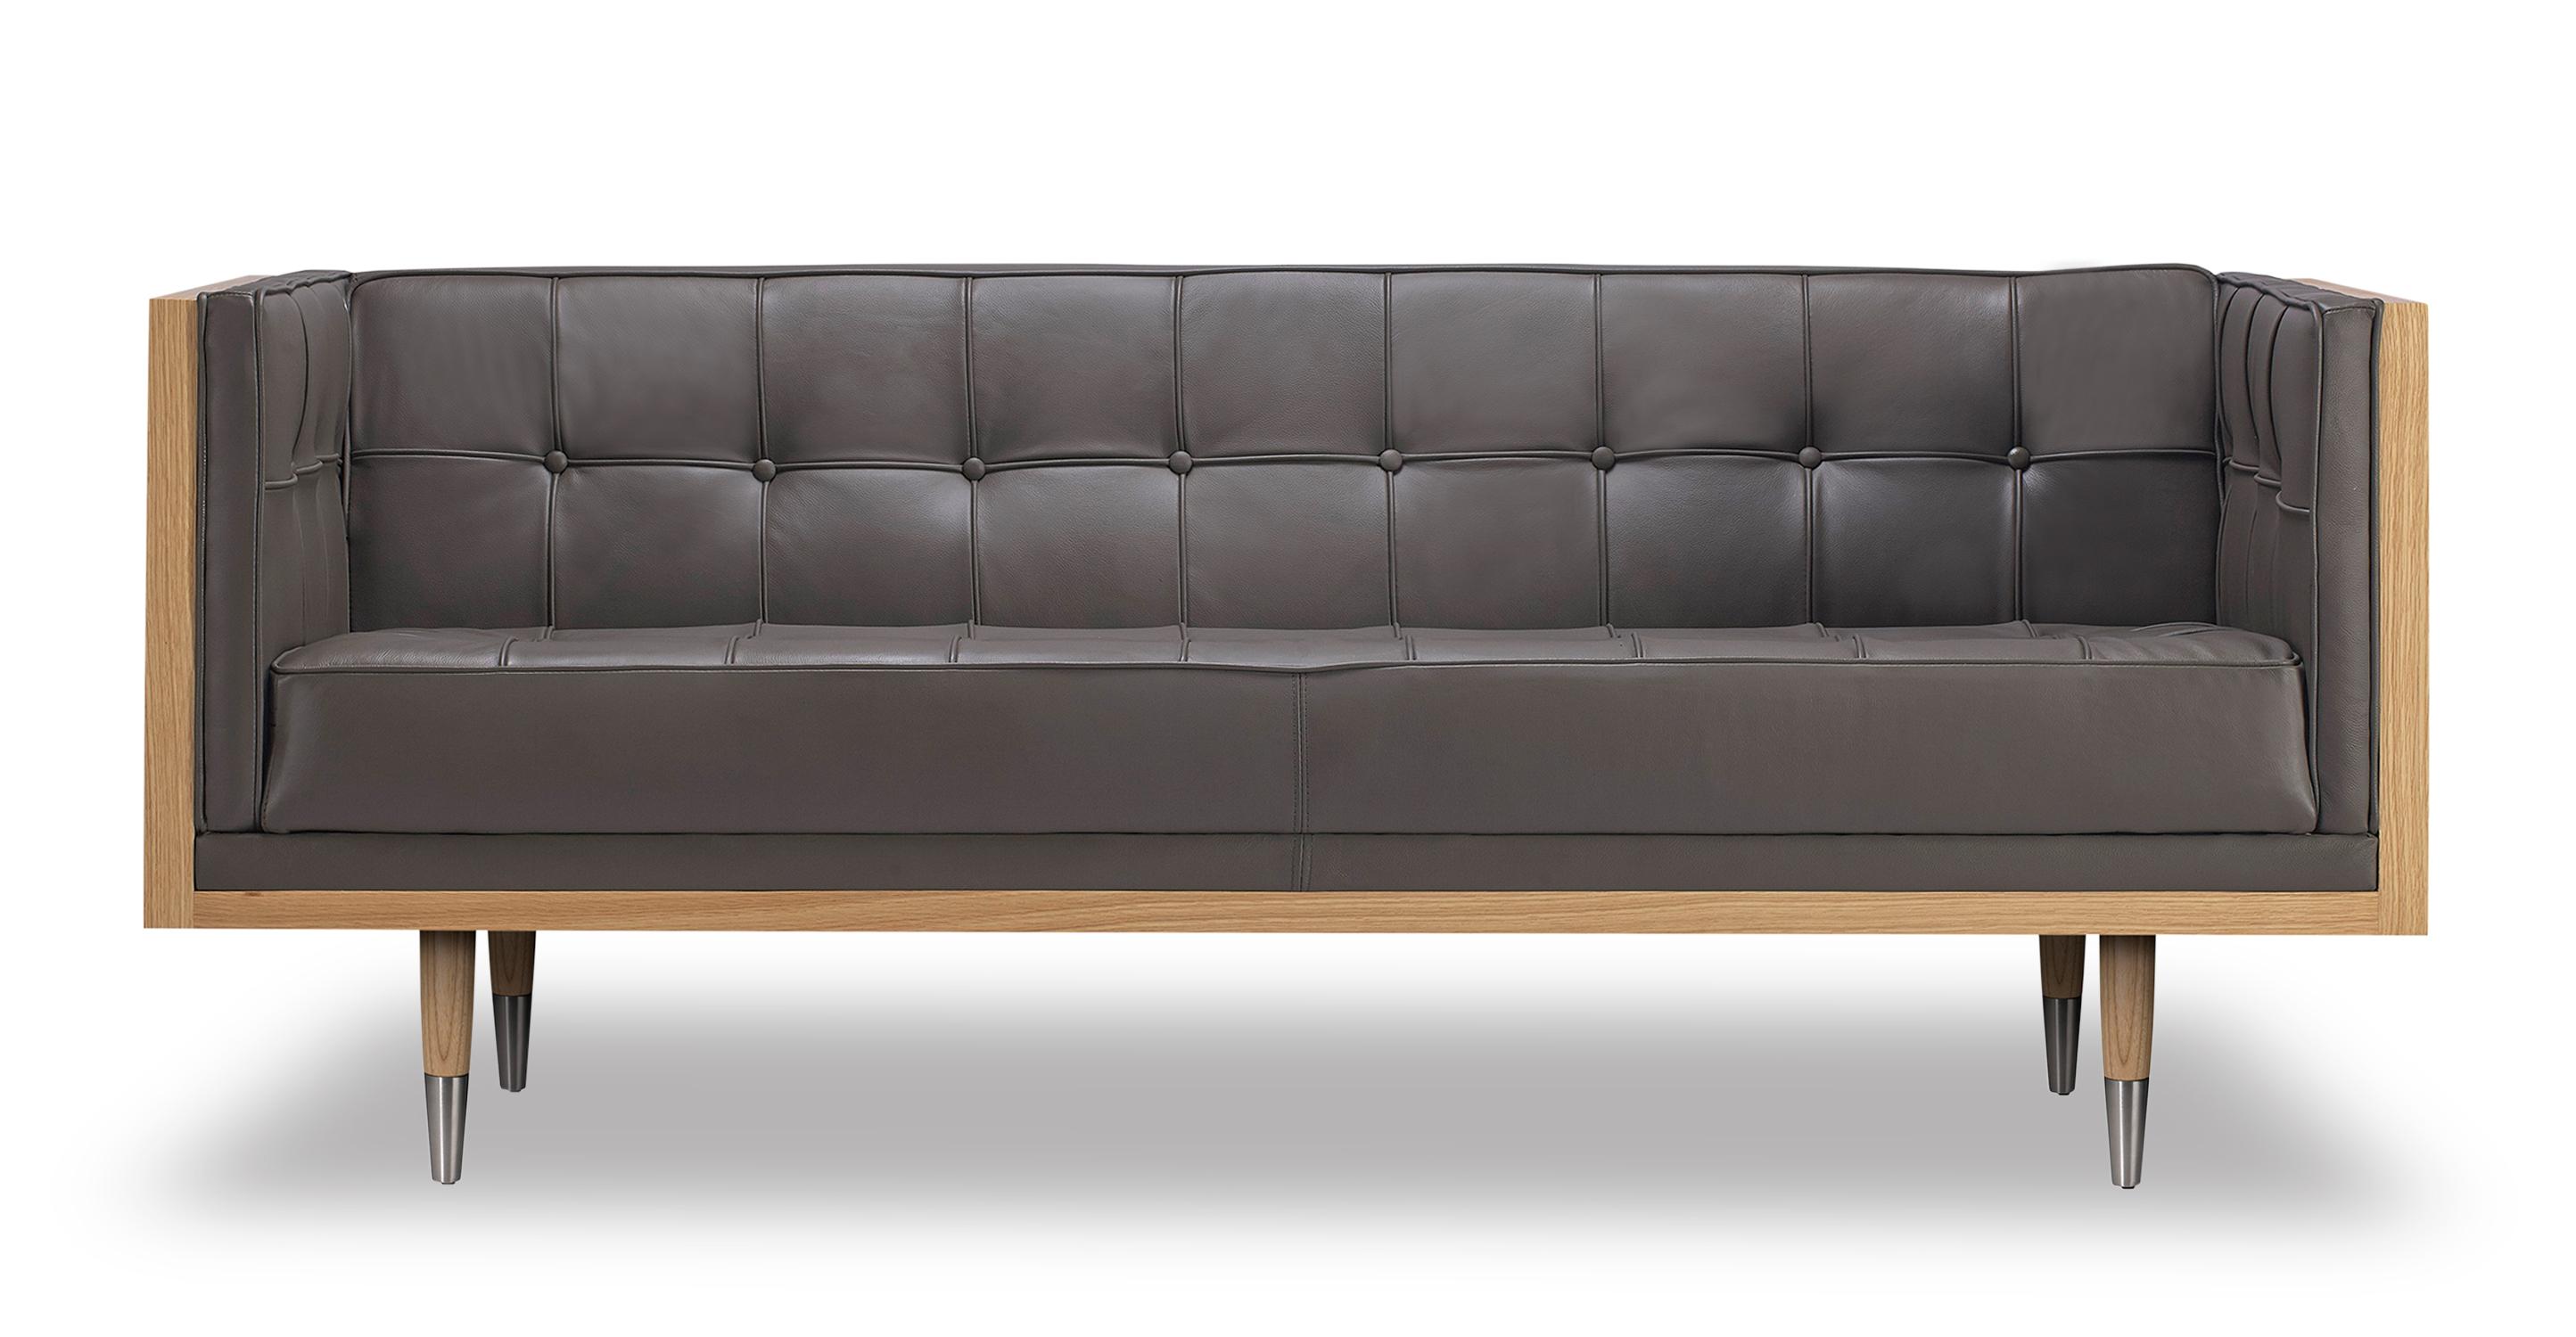 "Woodrow Box 71"" Leather Sofa, Ash/Grey Aniline"